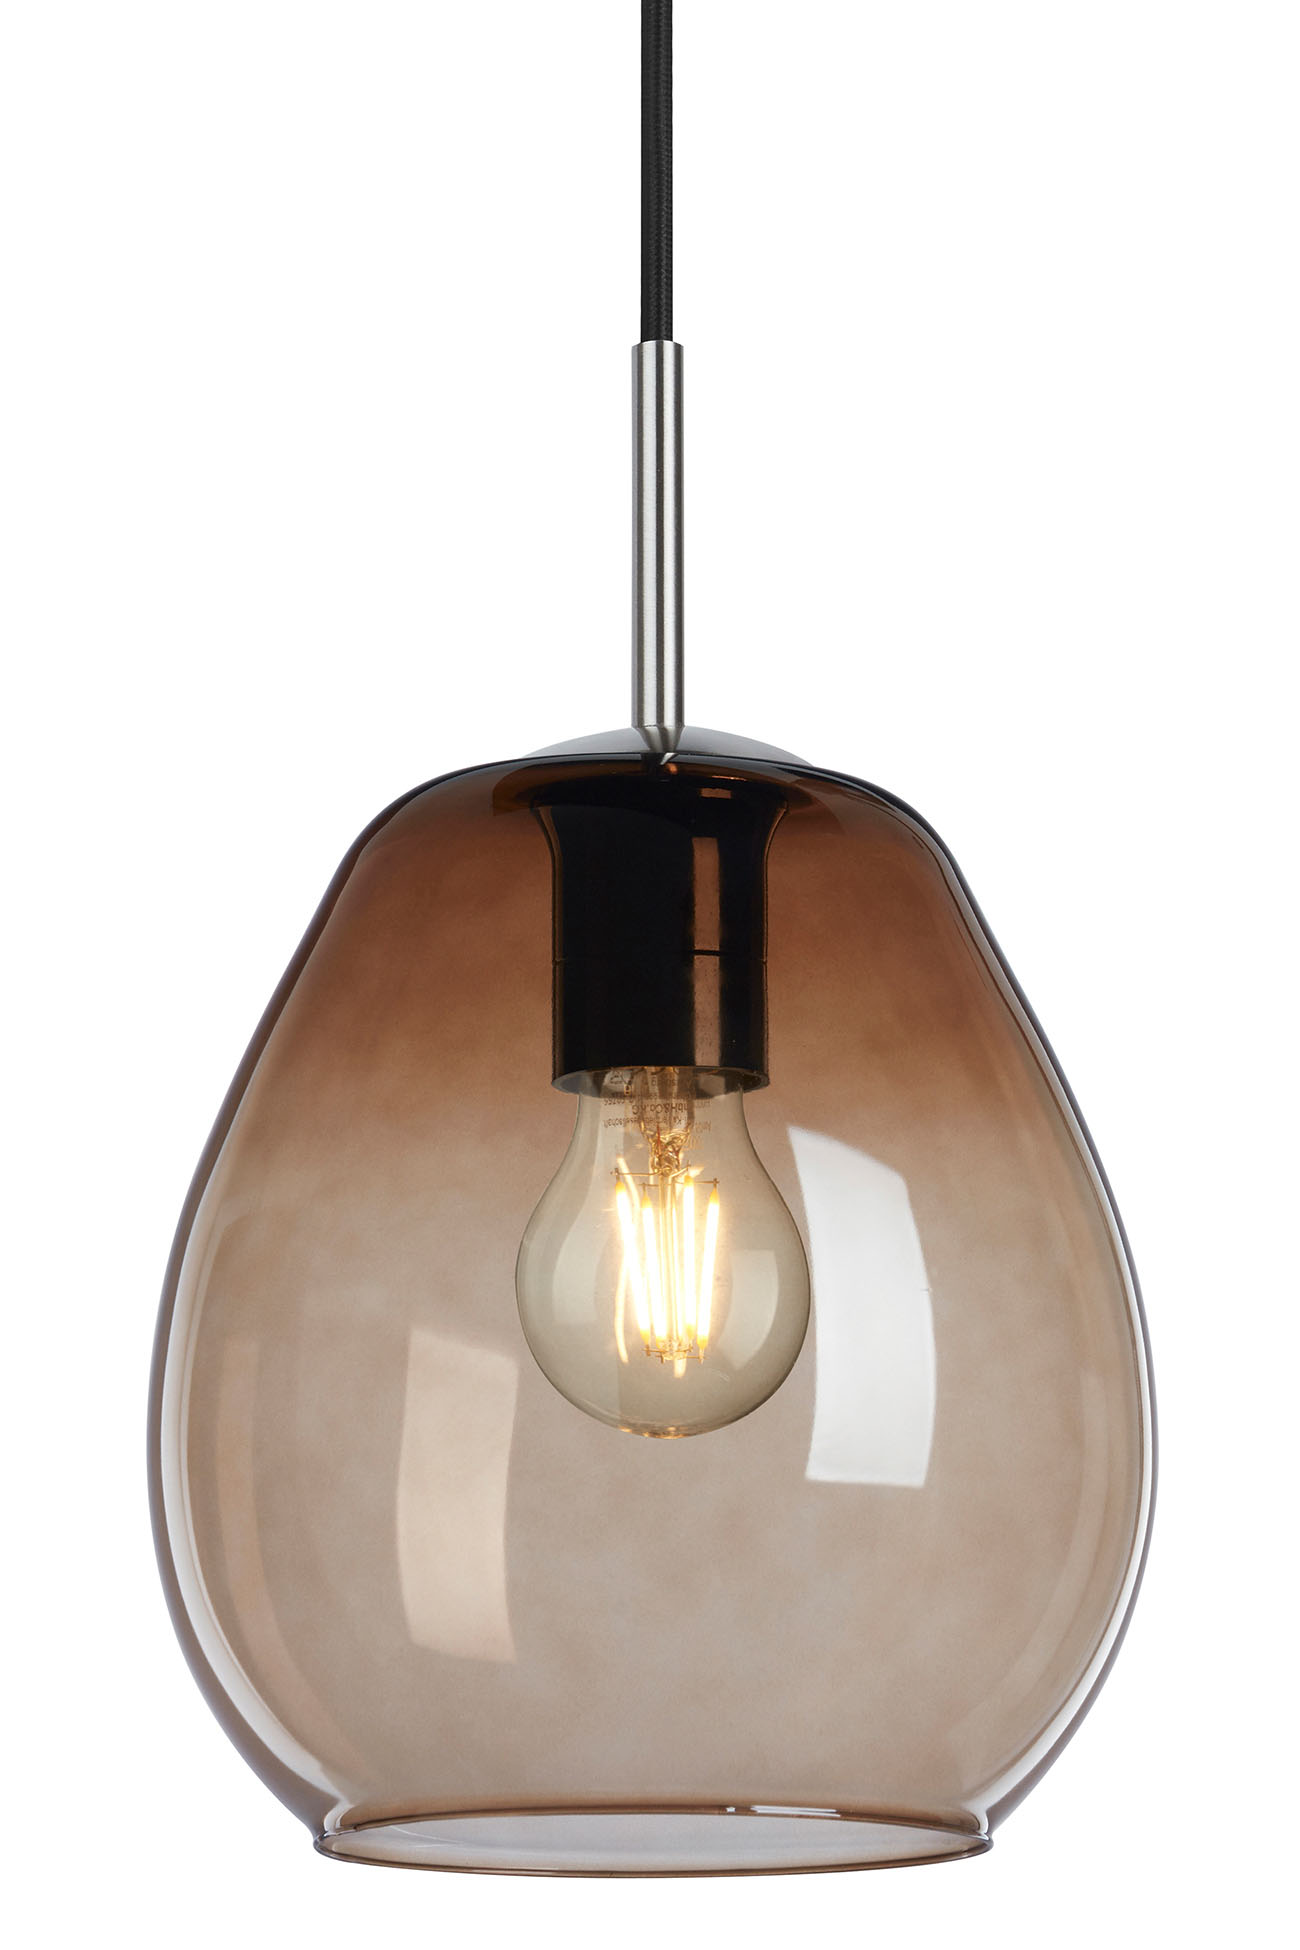 LED Pendelleuchte, Ø 22 cm, max. 40 W, Matt-Nickel-Chocolate